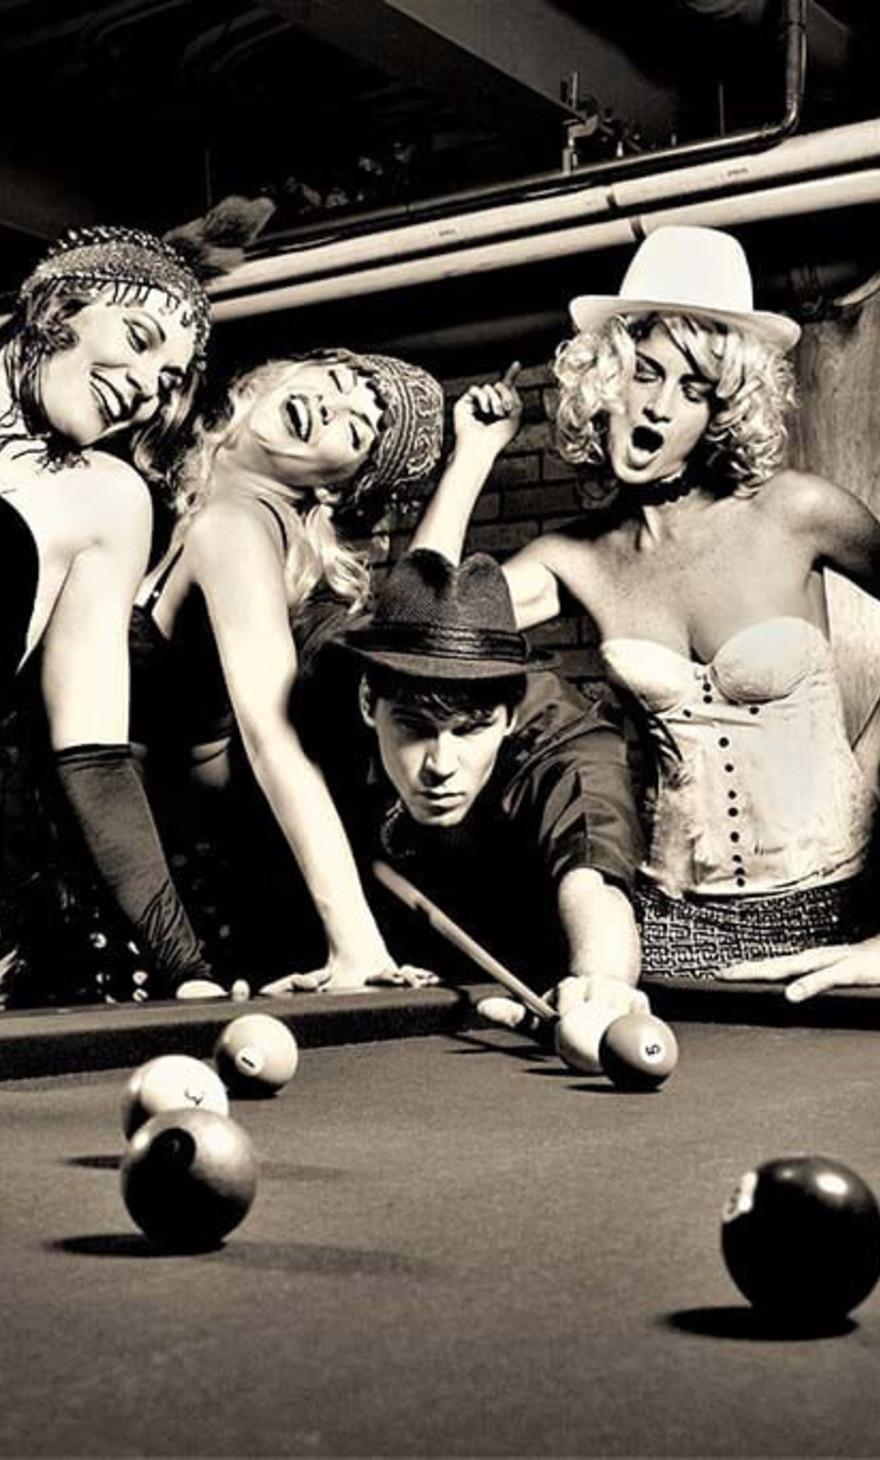 Retro people playing pool